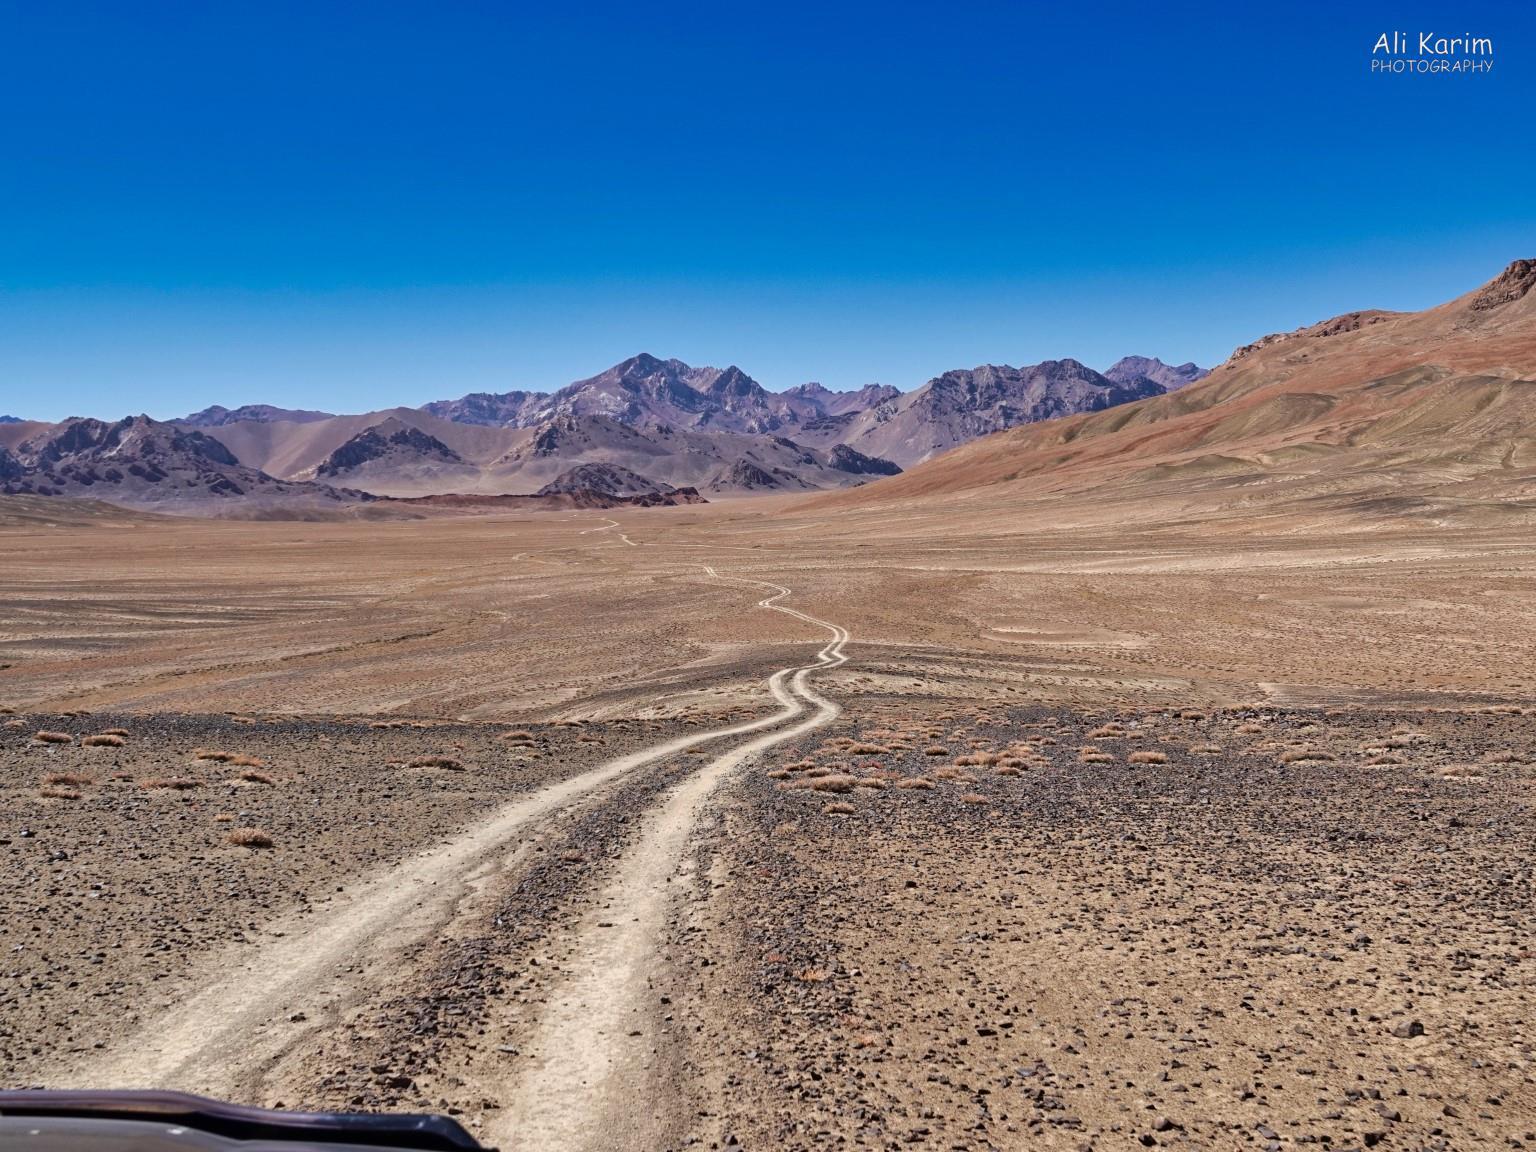 More Murghab & Alichur, Tajikistan, Our road from Shorbulak